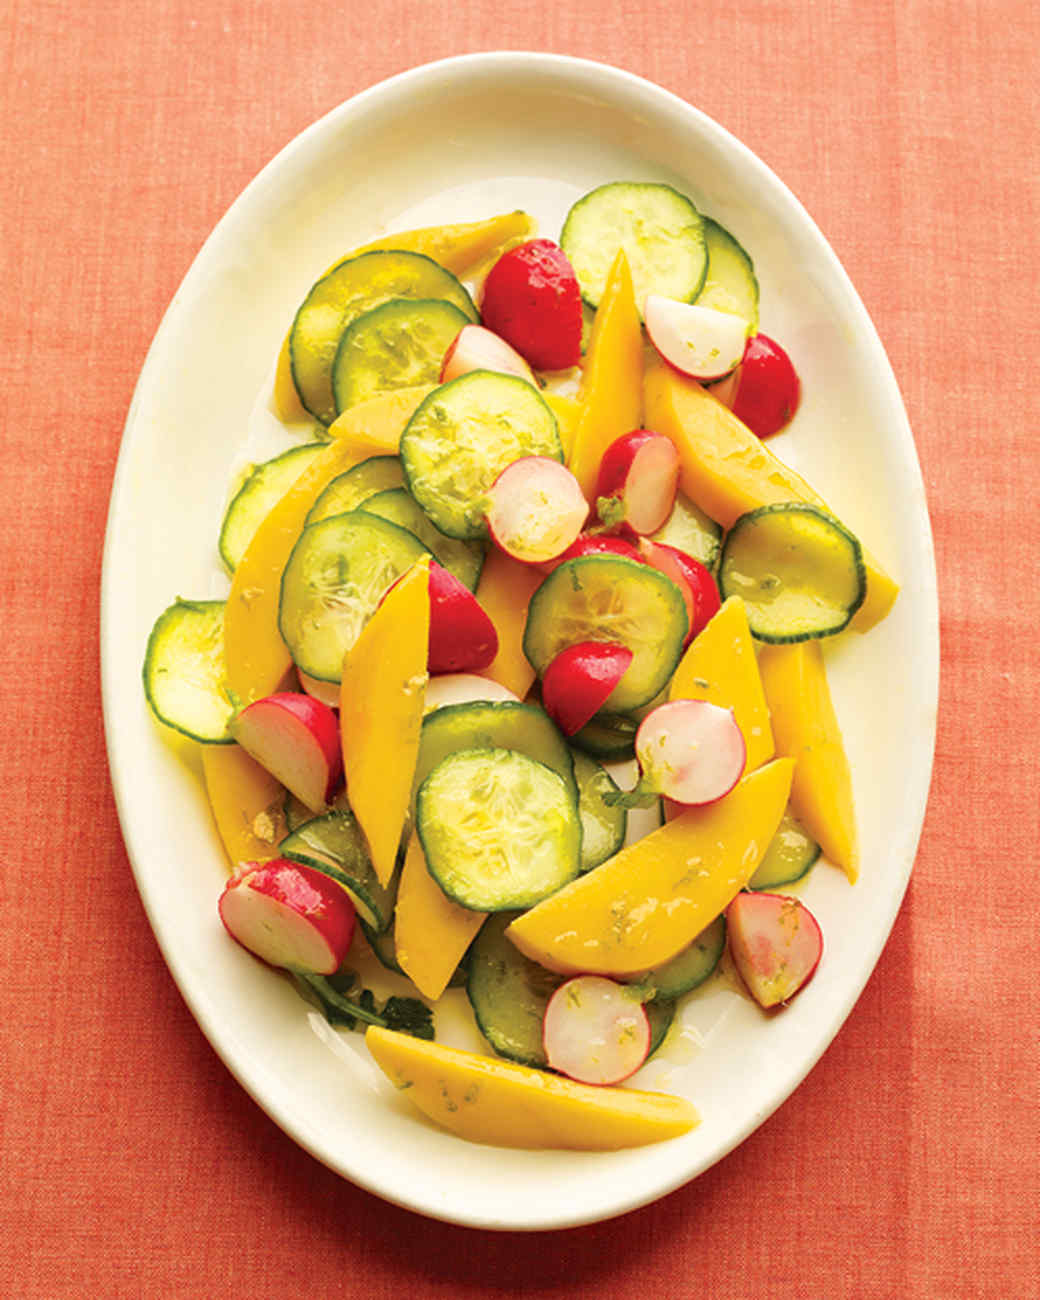 Mango and Radish Salad with Lime Dressing